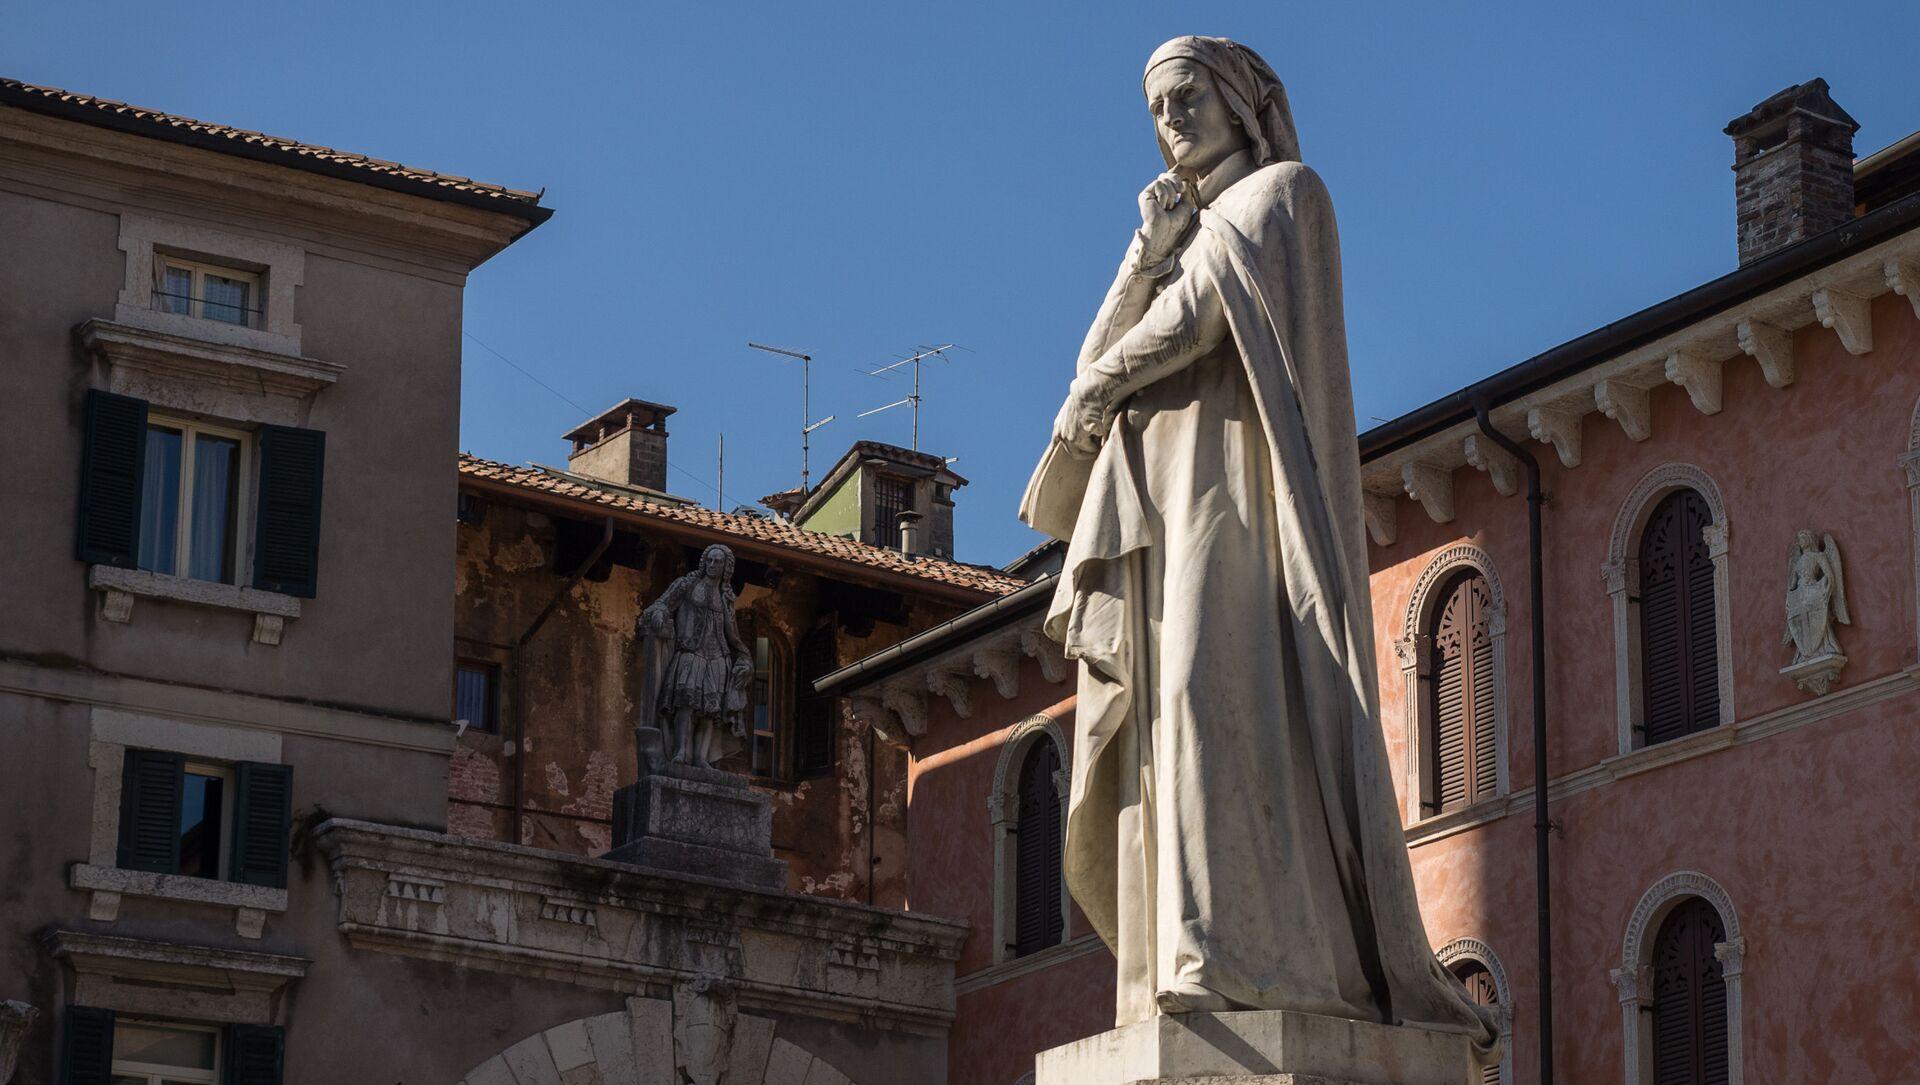 La statua di Dante a Piazza dei Signori, Verona - Sputnik Italia, 1920, 25.03.2021